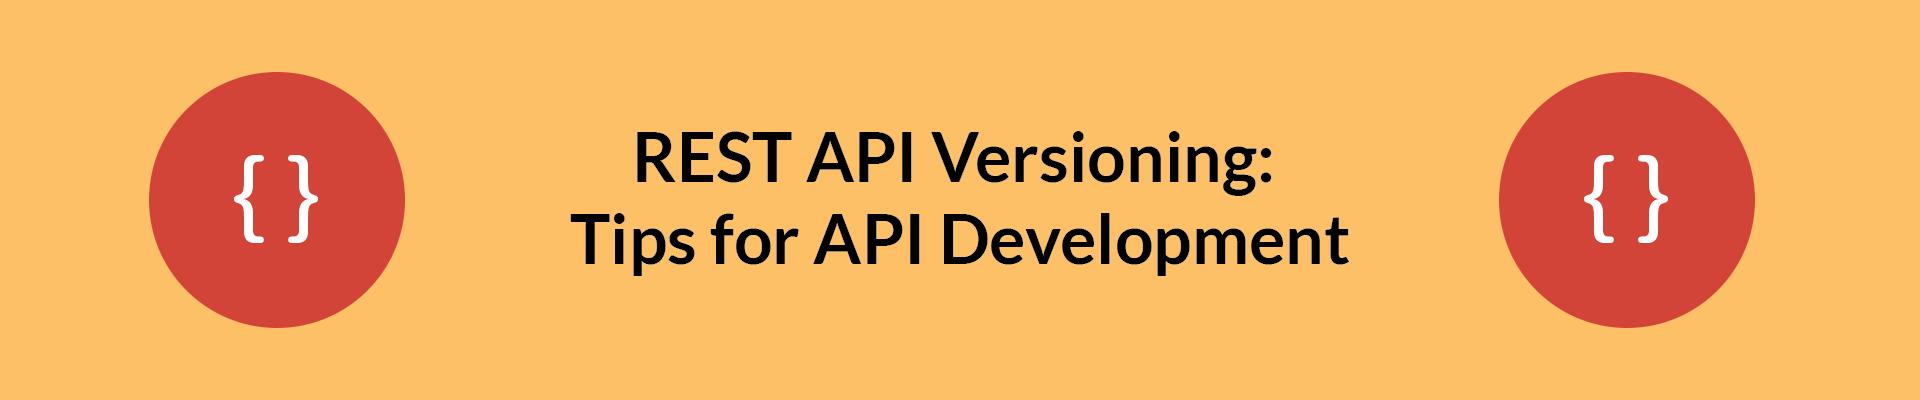 REST API Versioning